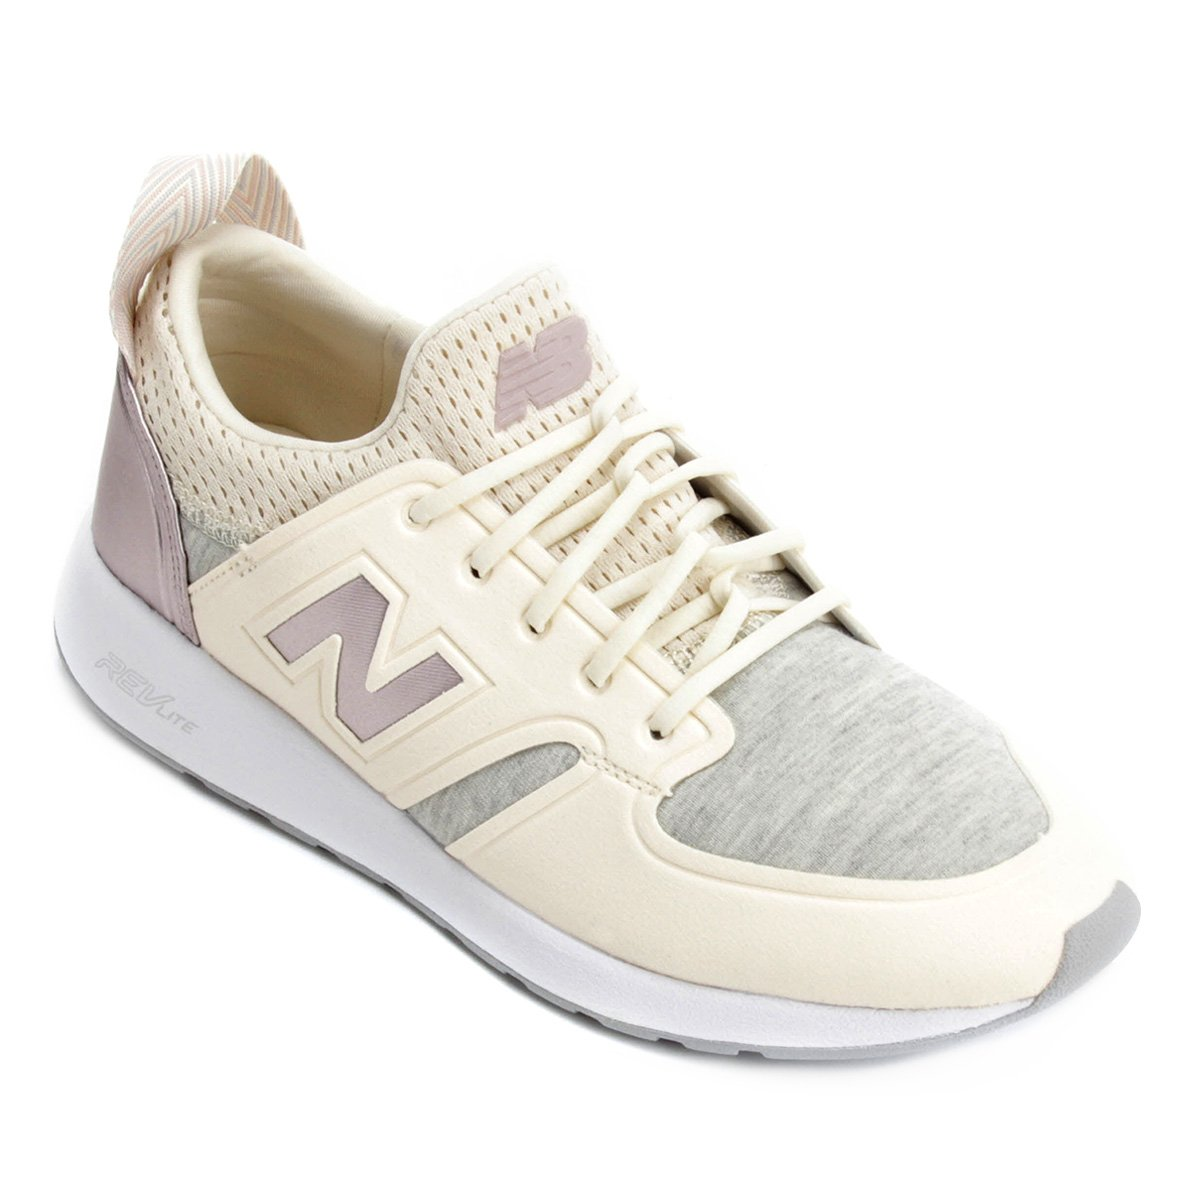 d7ac36ac2 ... shopping tênis new balance w 420 feminino branco 20e3e d2446